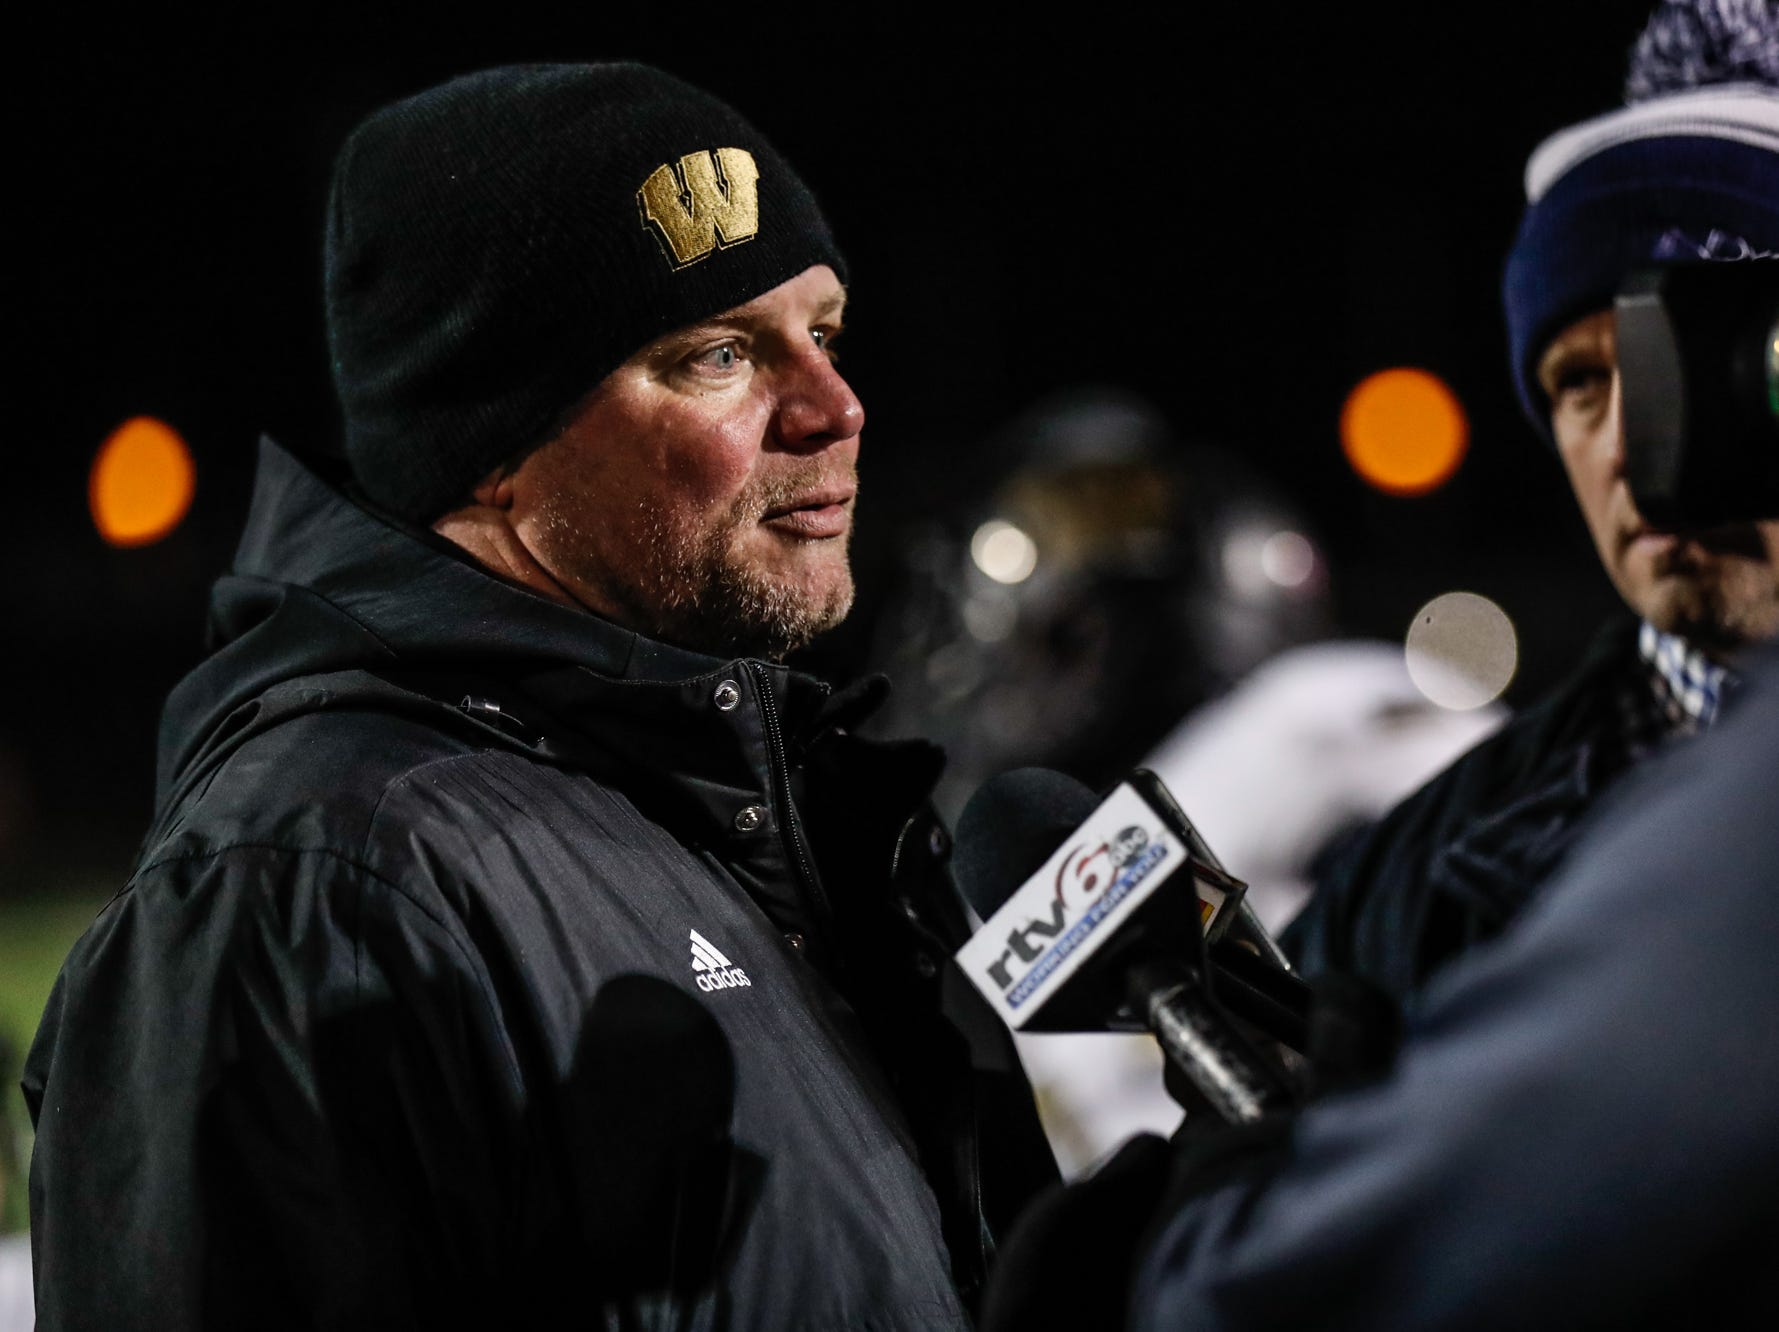 The Warren Central High School Warriors varsity football Coach, Jayson West is interviewed after winning a regional final game against North Central High School Panthers at North Central on Friday, Nov. 9, 2018.